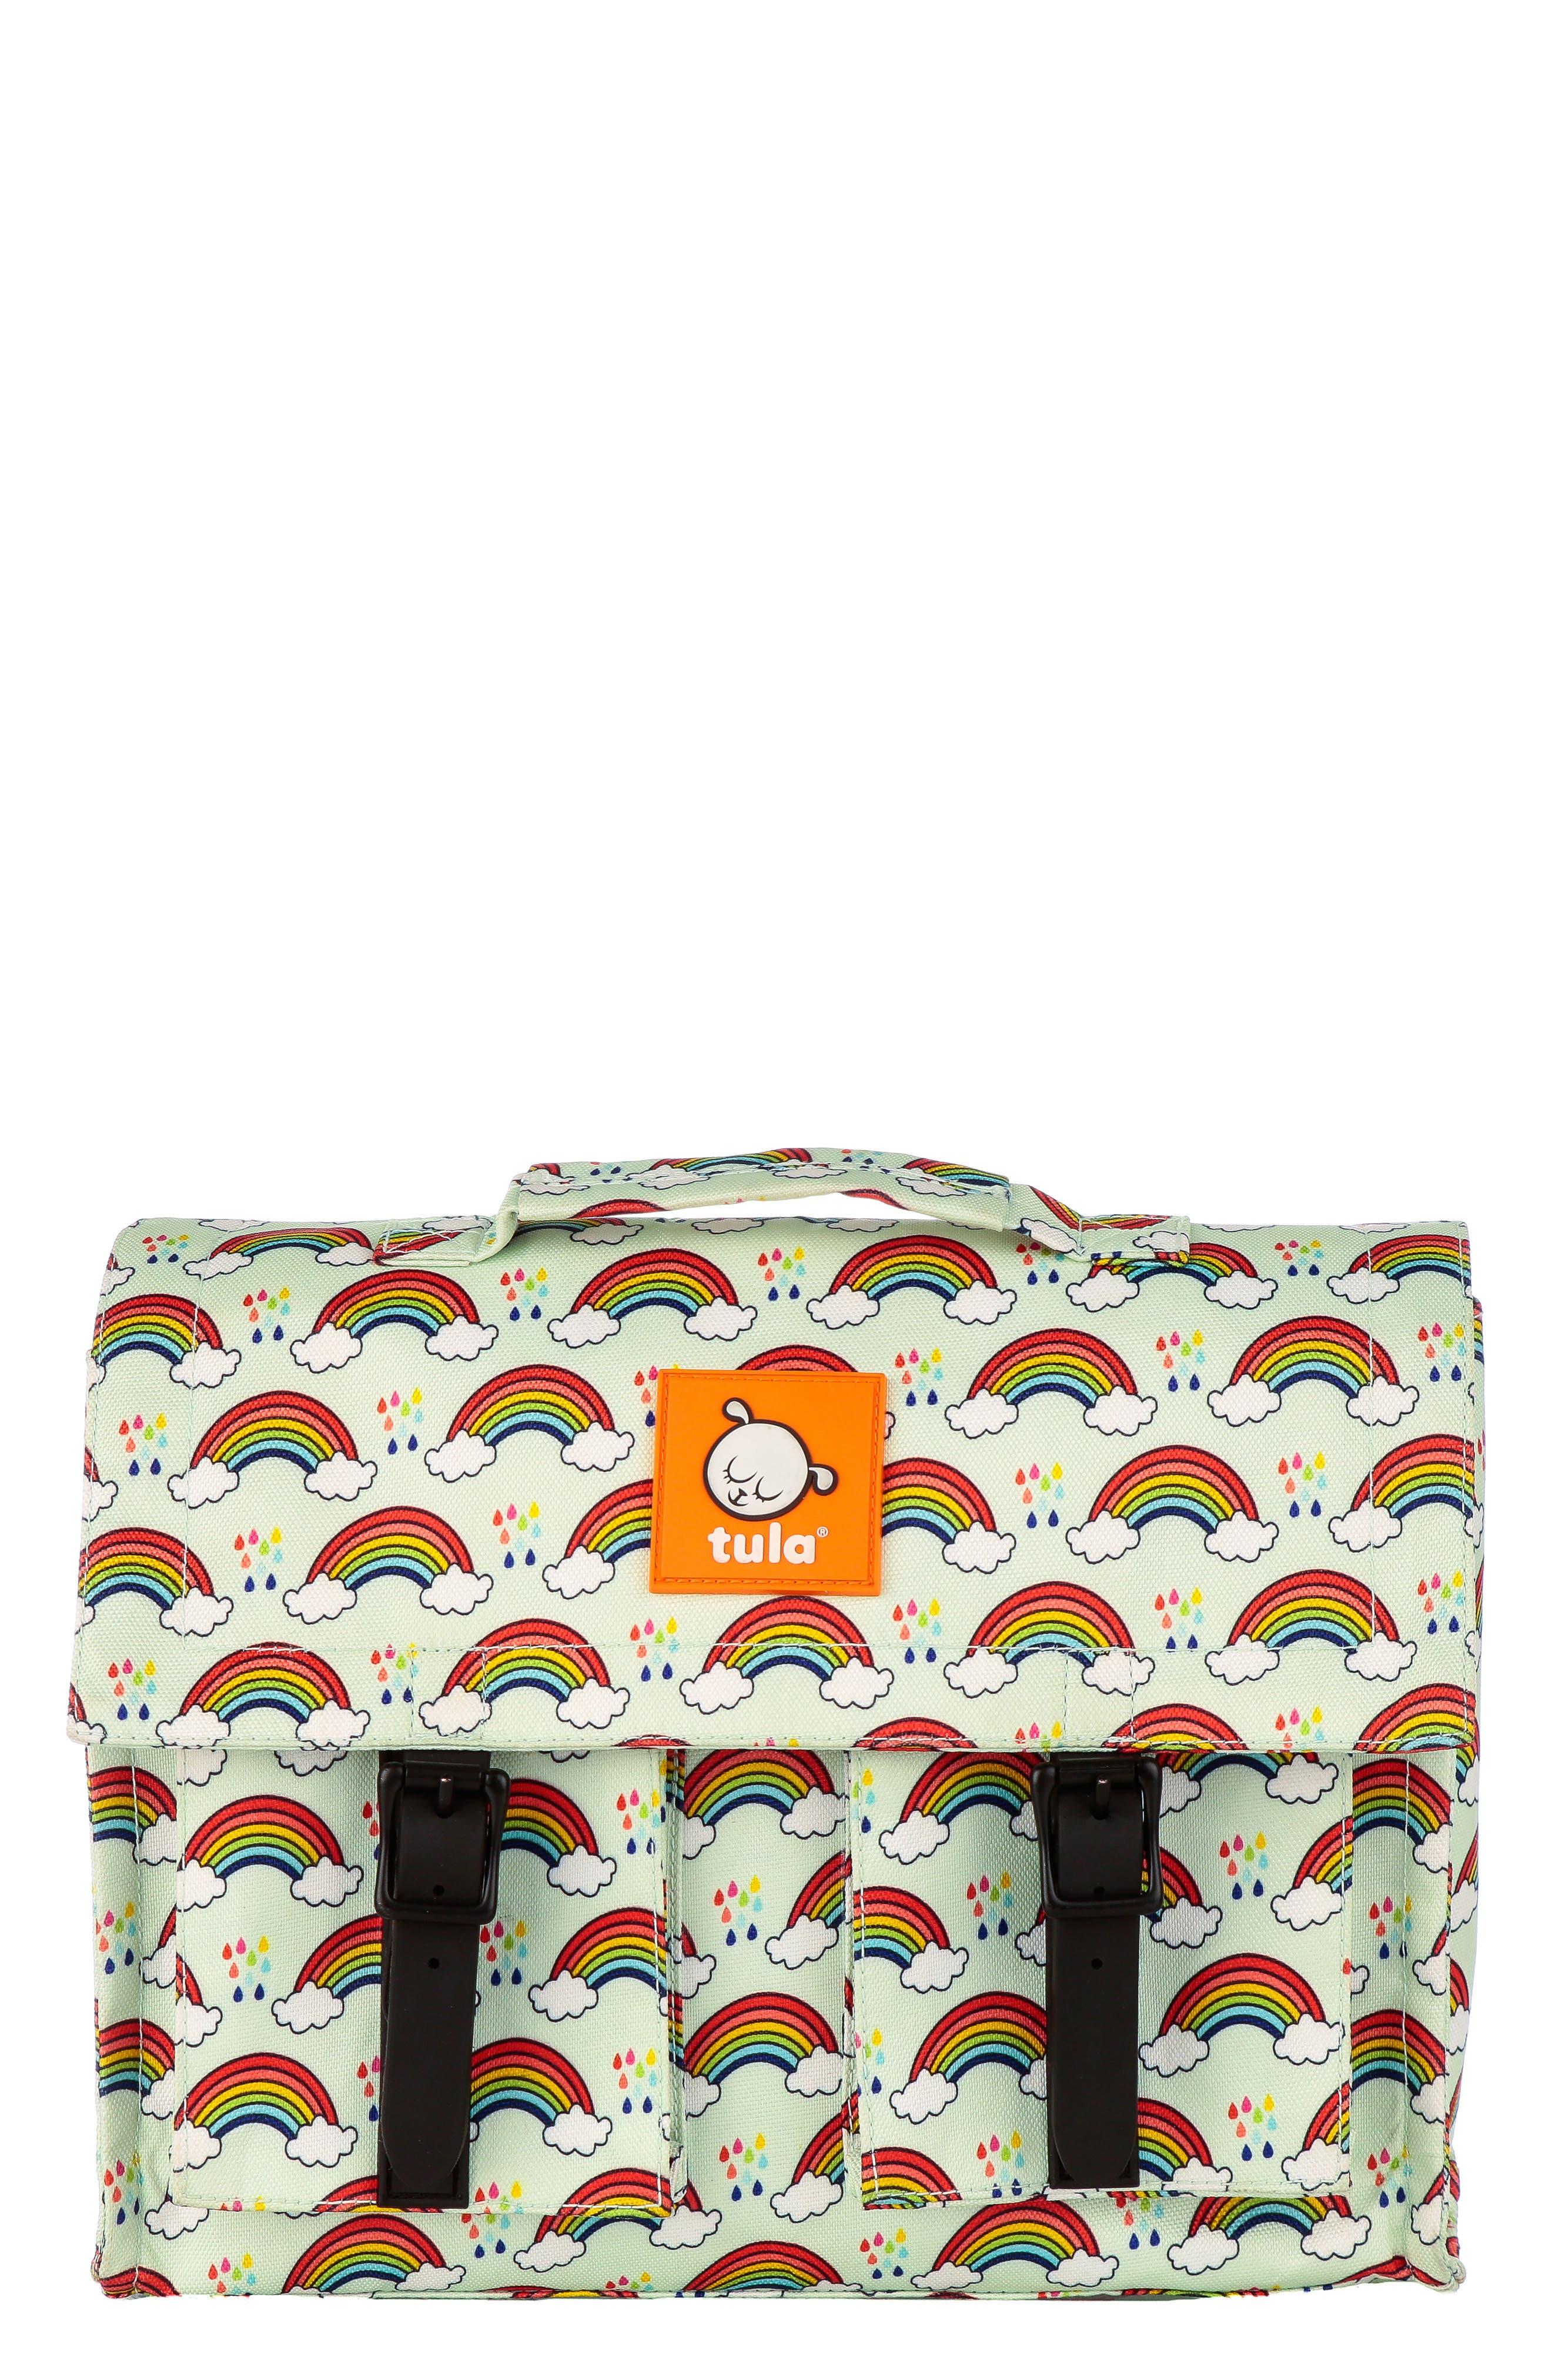 BABY TULA,                             Rainbow Showers Backpack,                             Main thumbnail 1, color,                             300